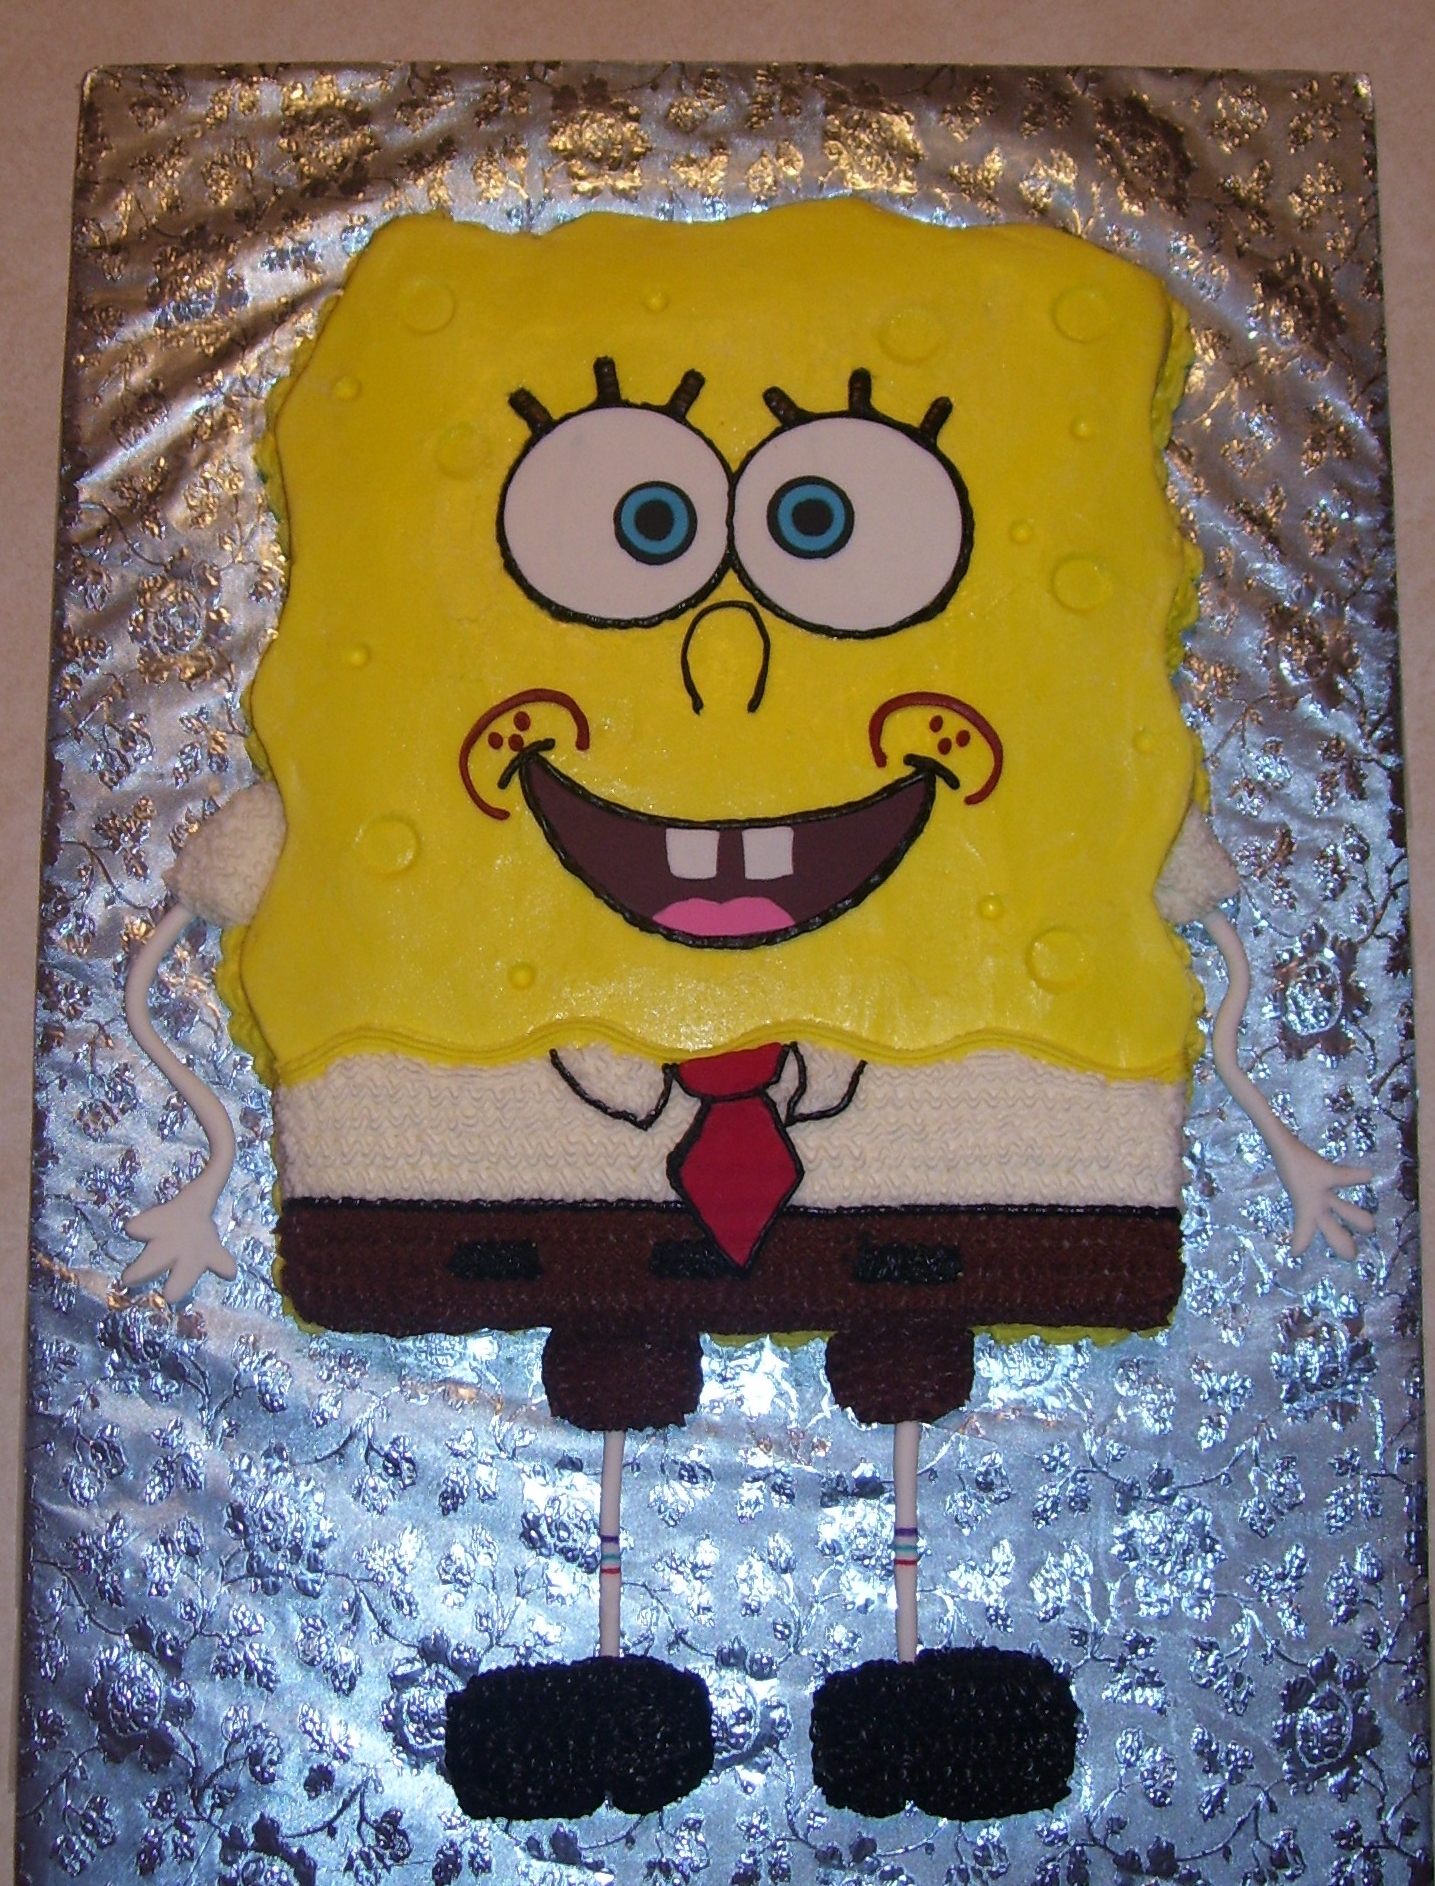 SpongeBob -copyright,no sell